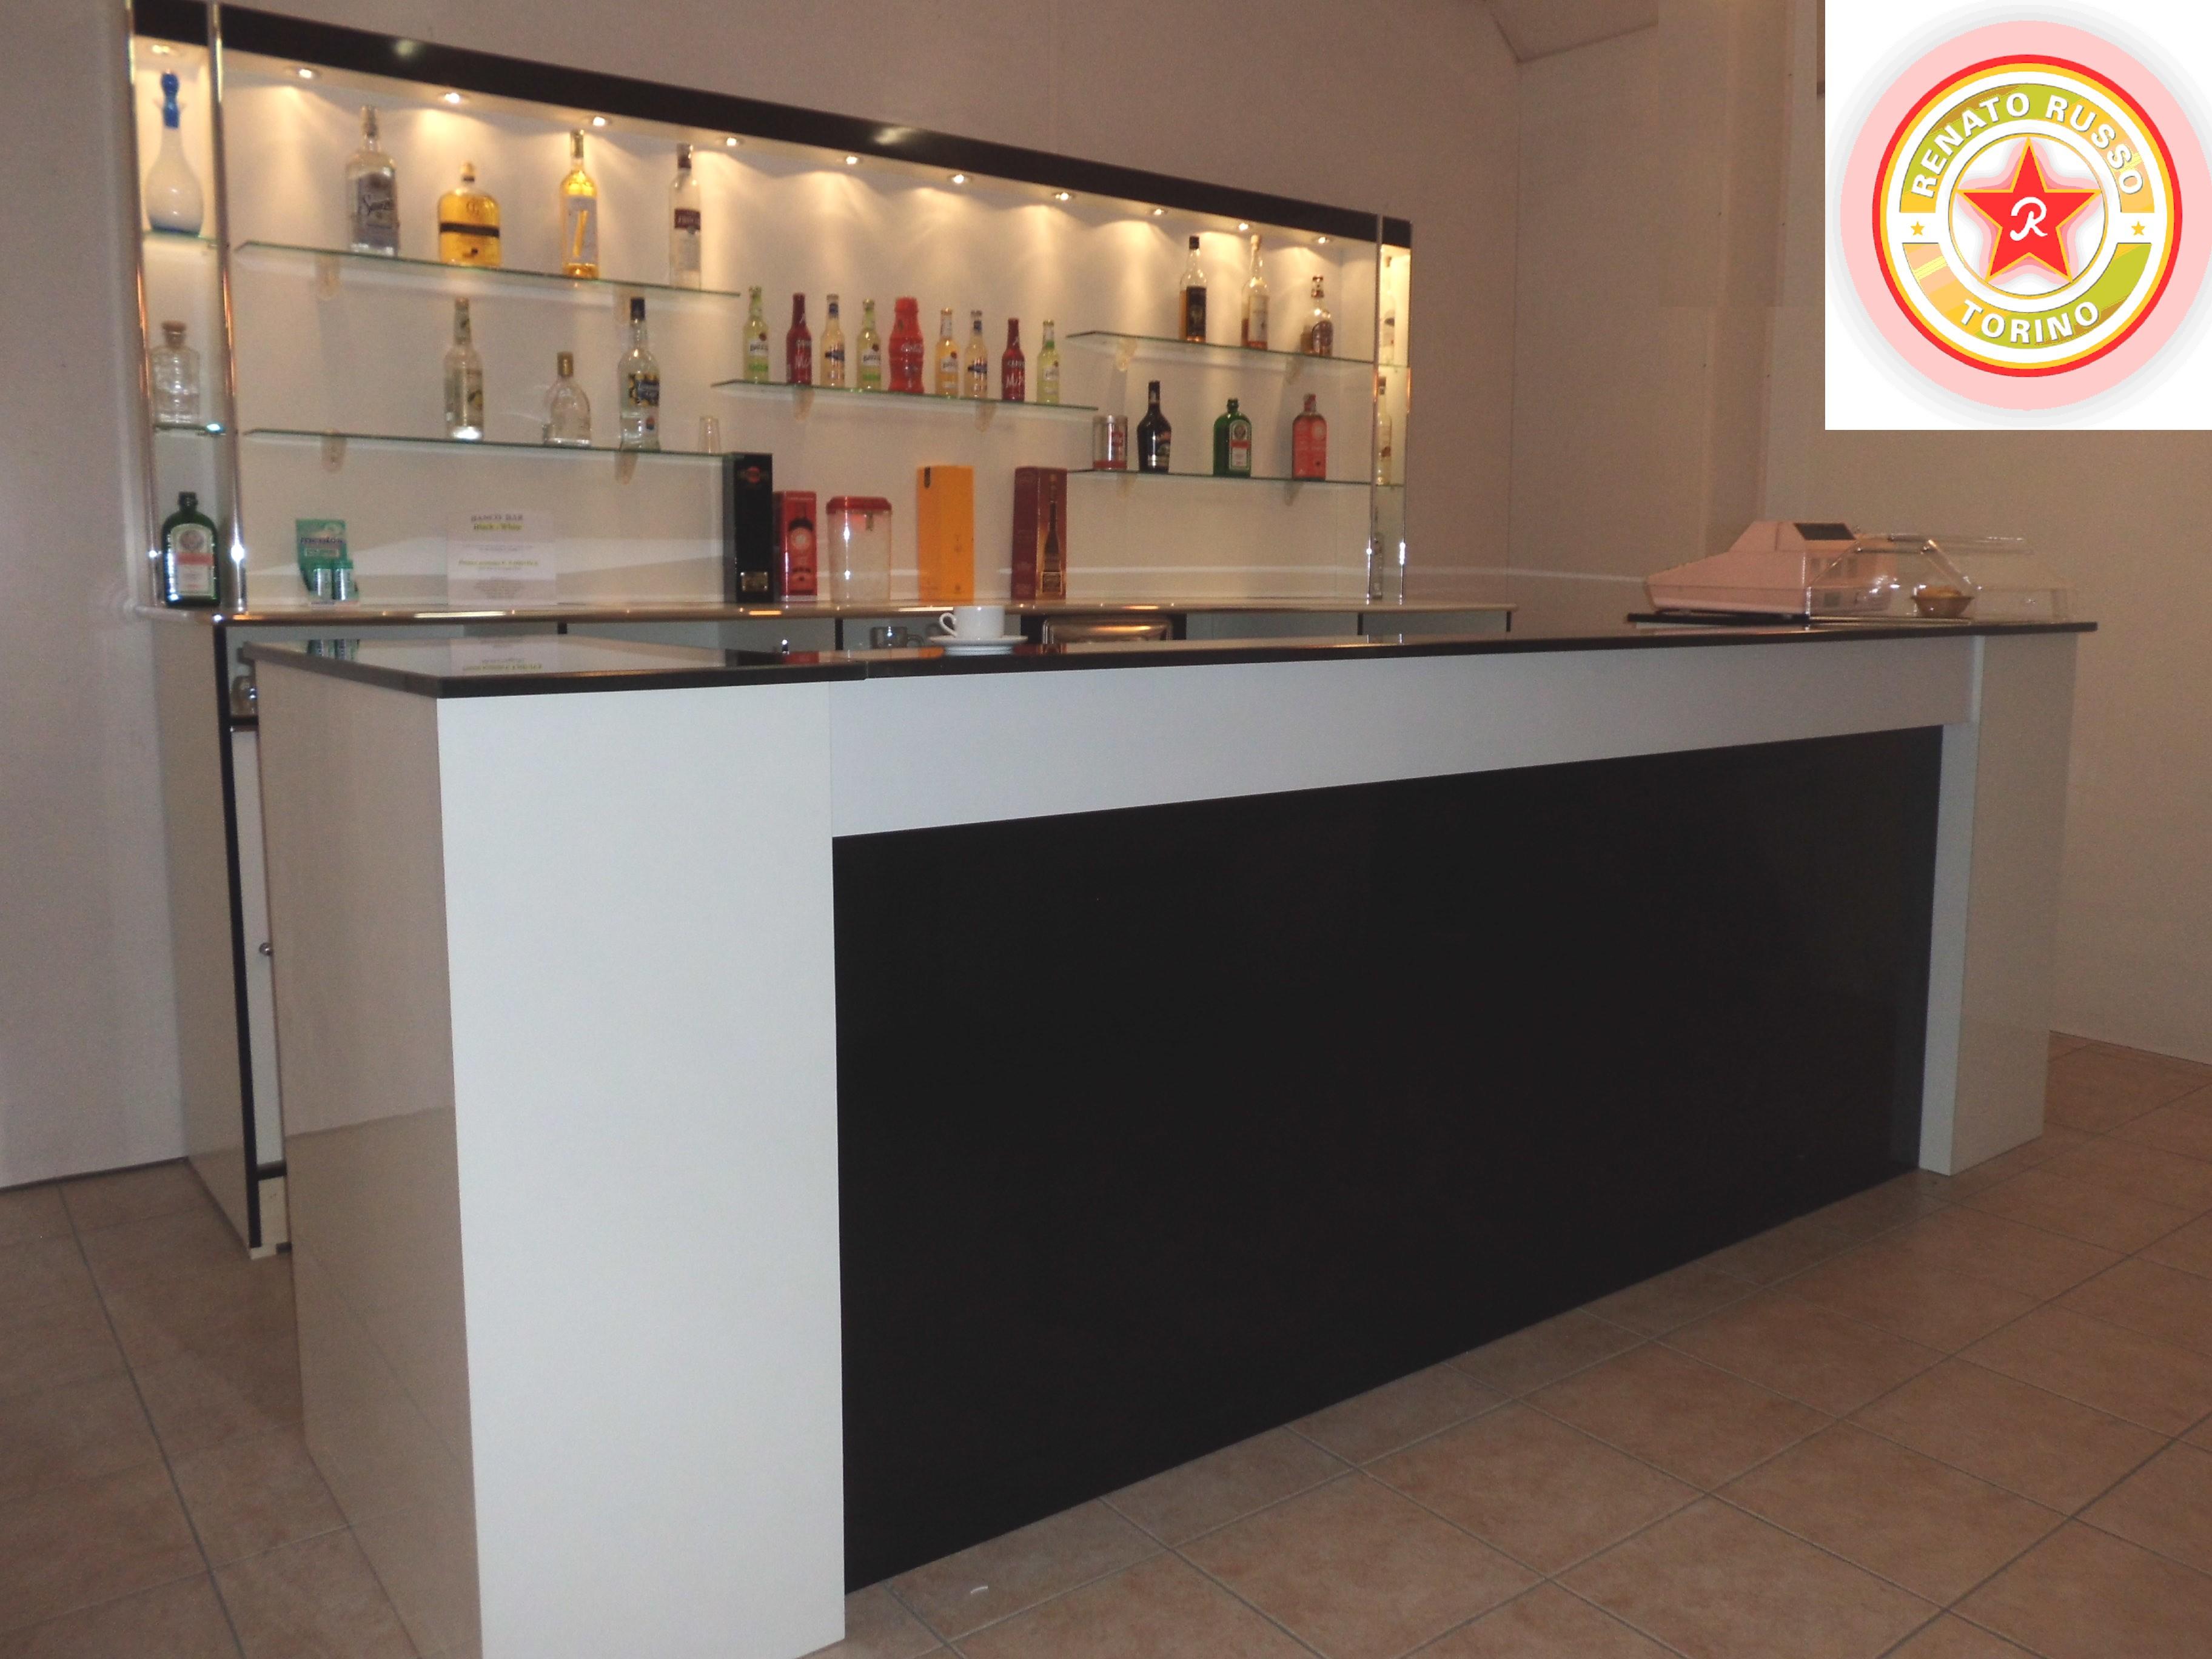 ... Per Bar, Frigoriferi Per Bar, Banchi Bar Grezzi, Banchi Bar Fi